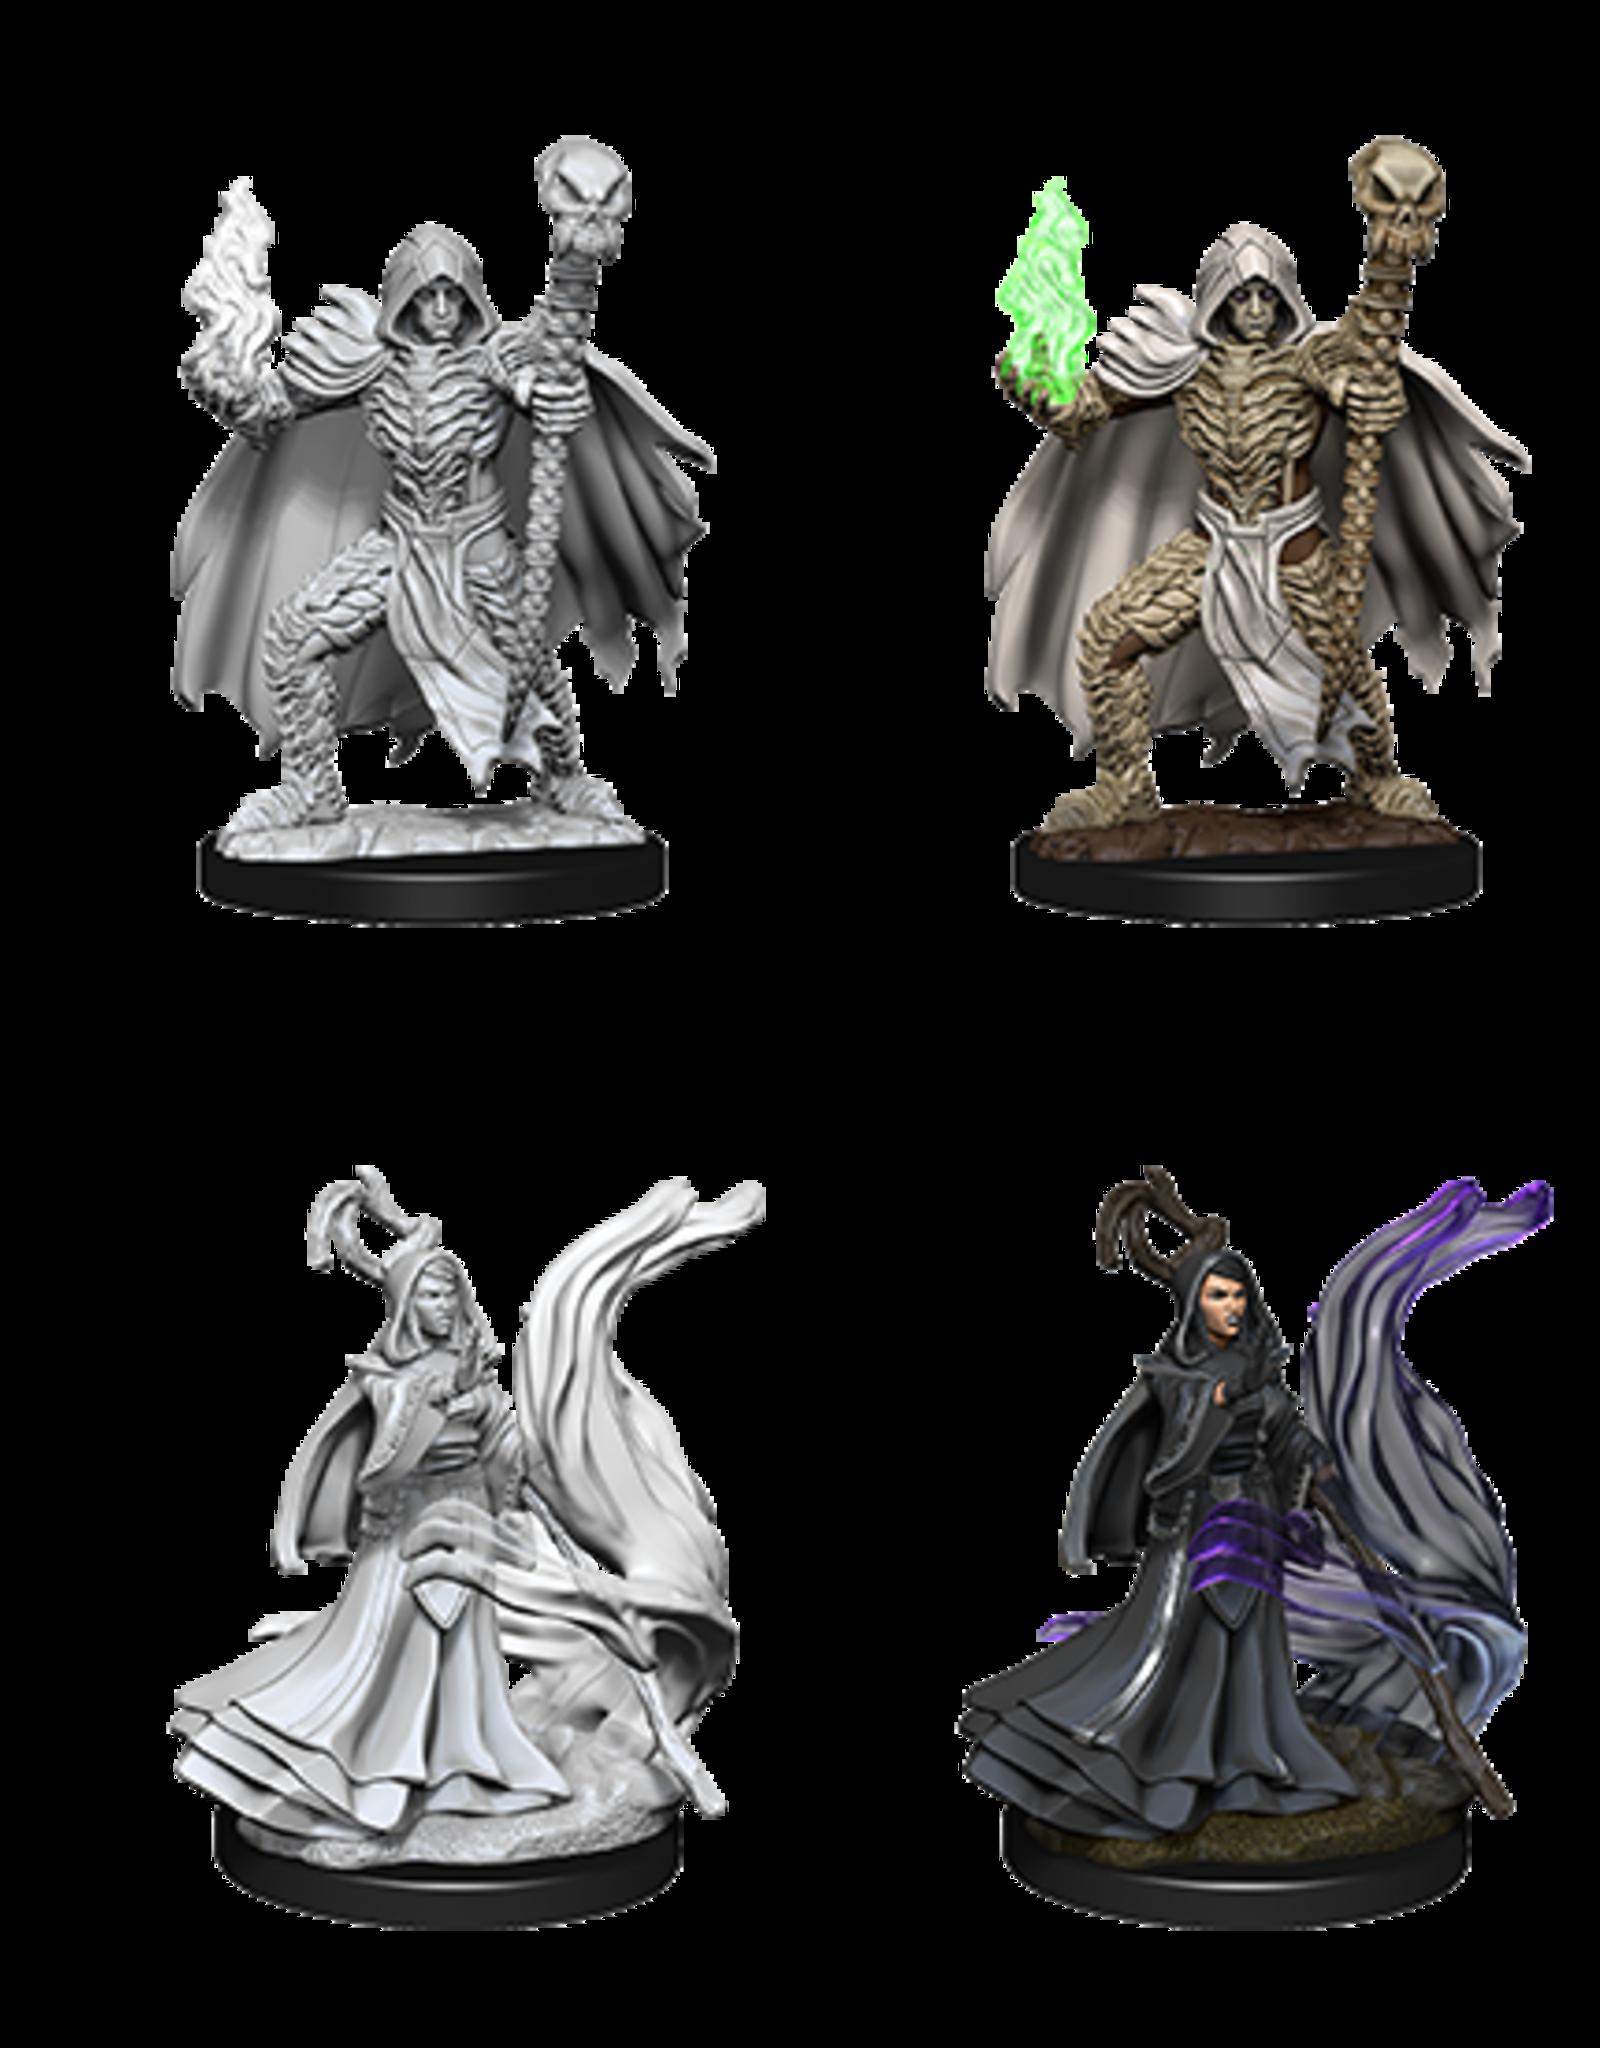 Dungeons & Dragons D&D NMU - Necromancers (W10)